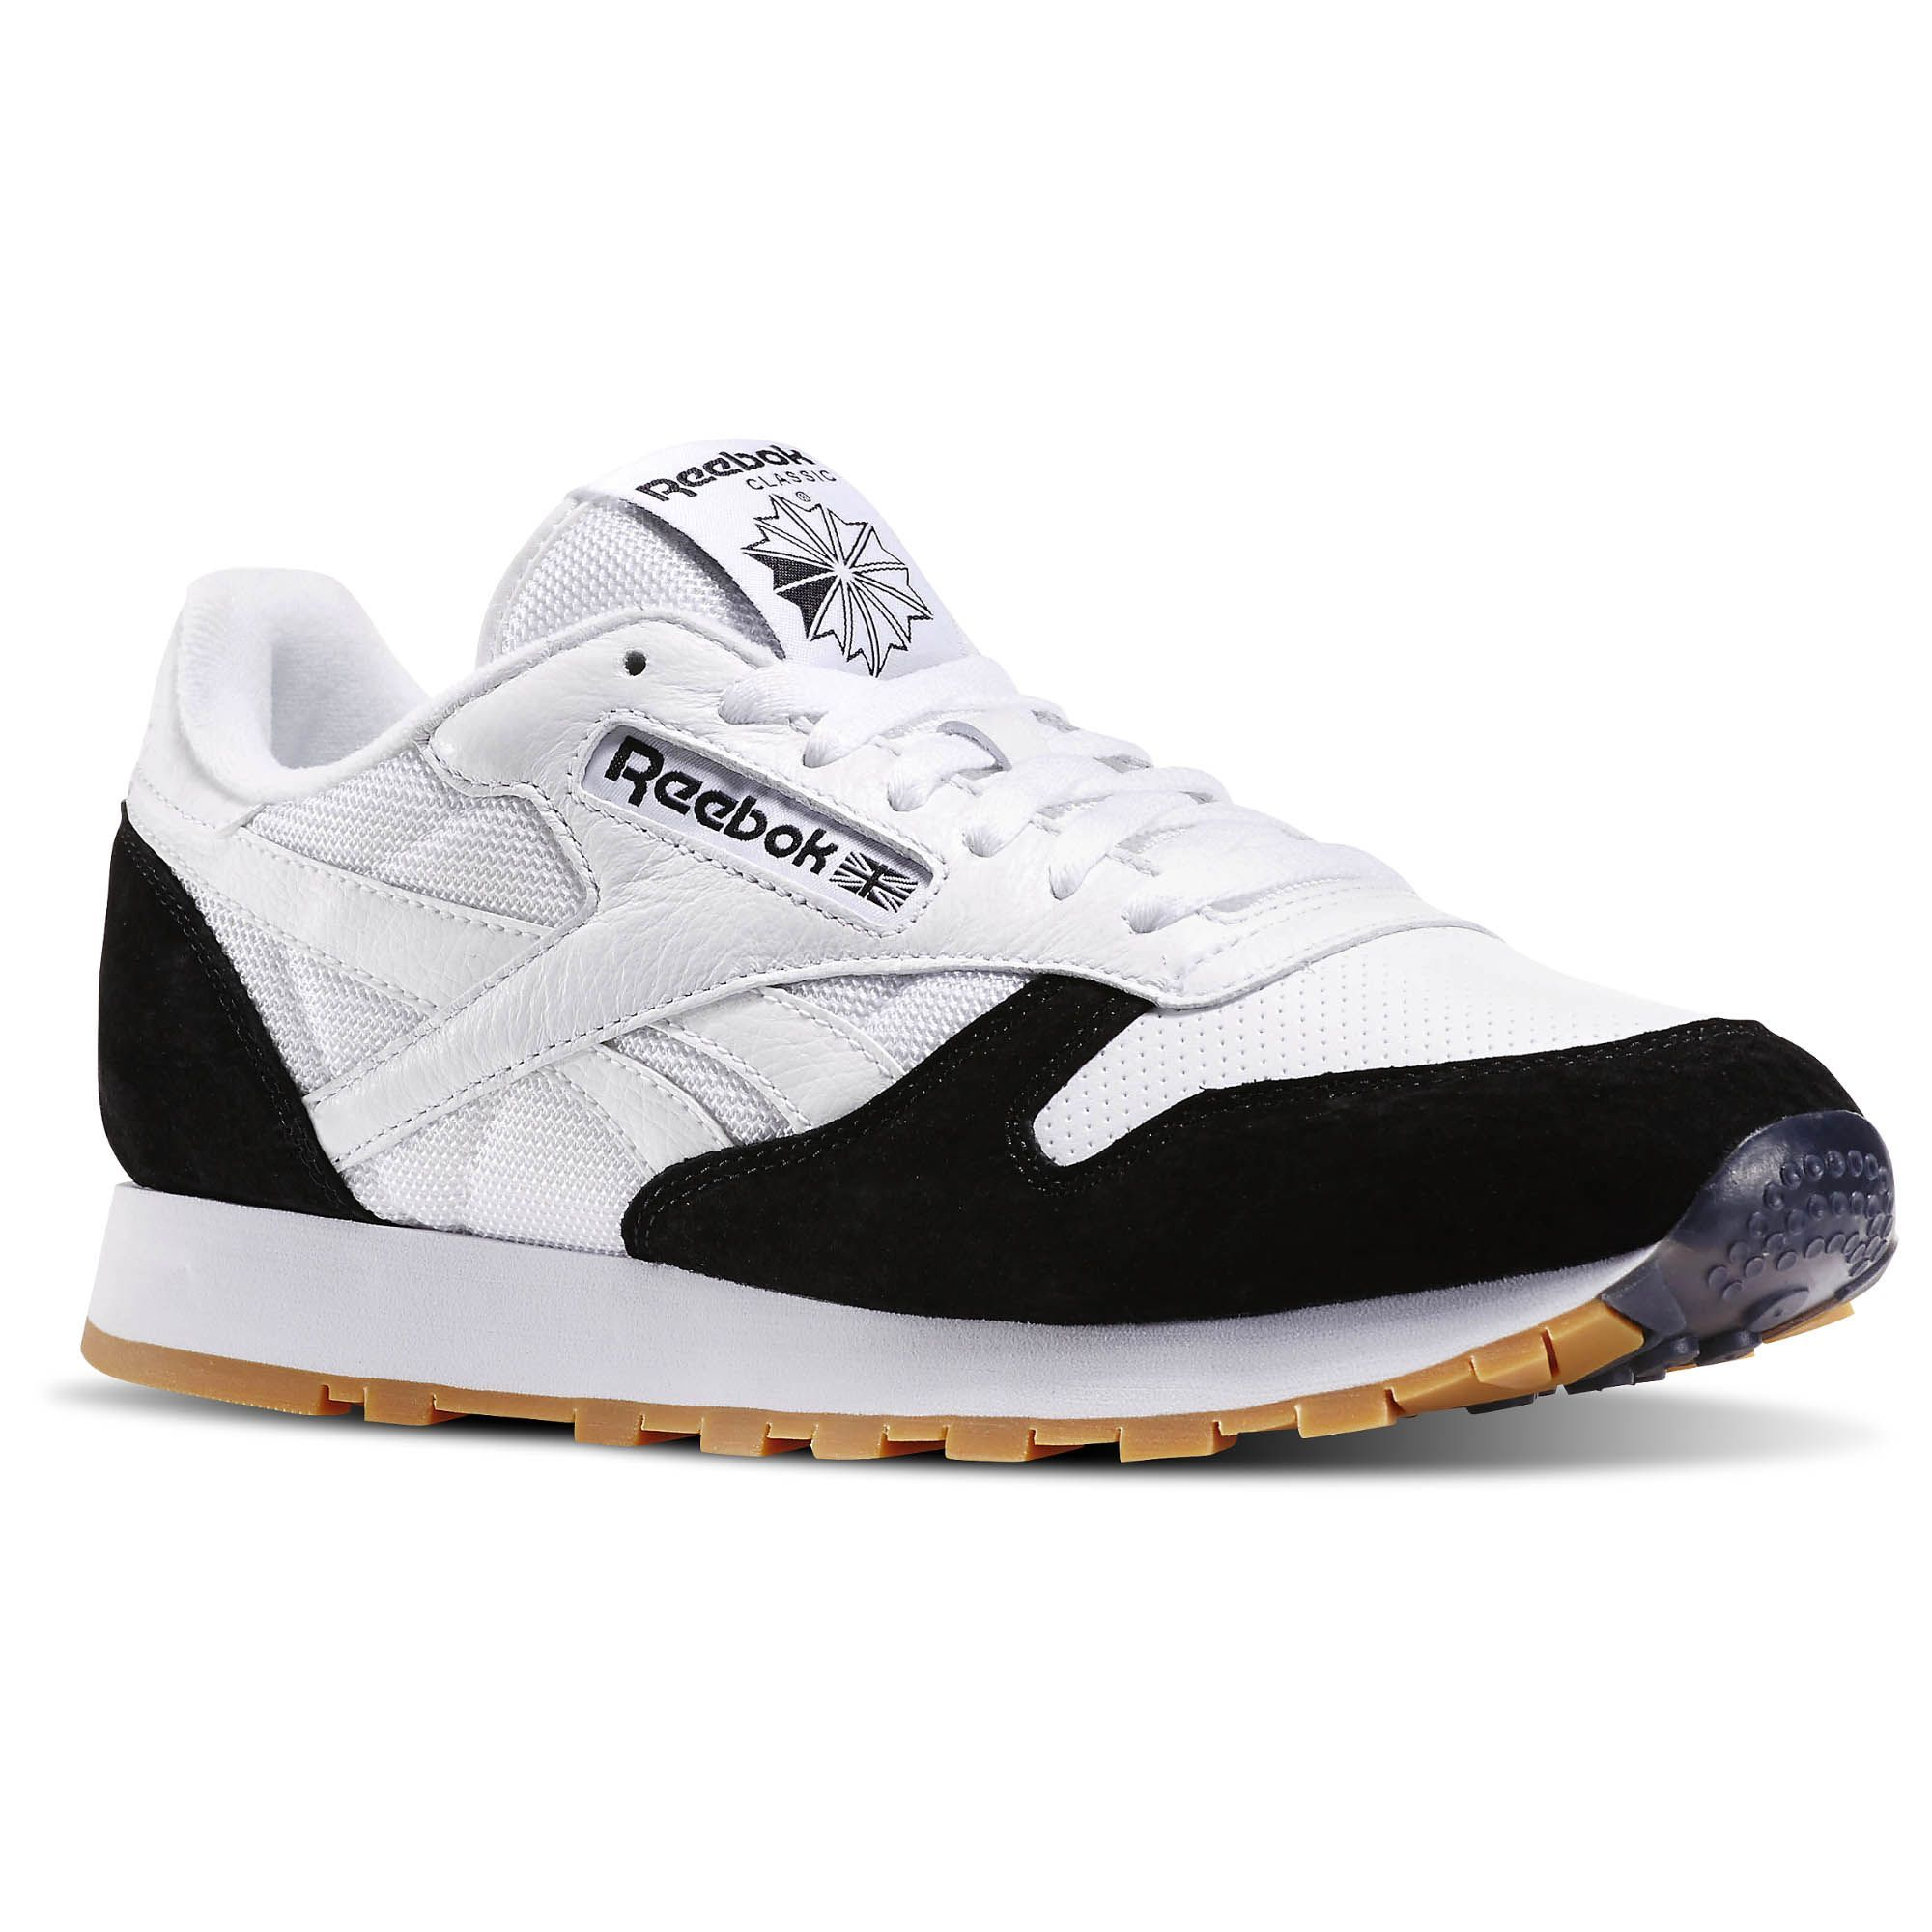 LeatherShoes Reebok Chaussure Classic Sport SneakersEt ALqRc54j3